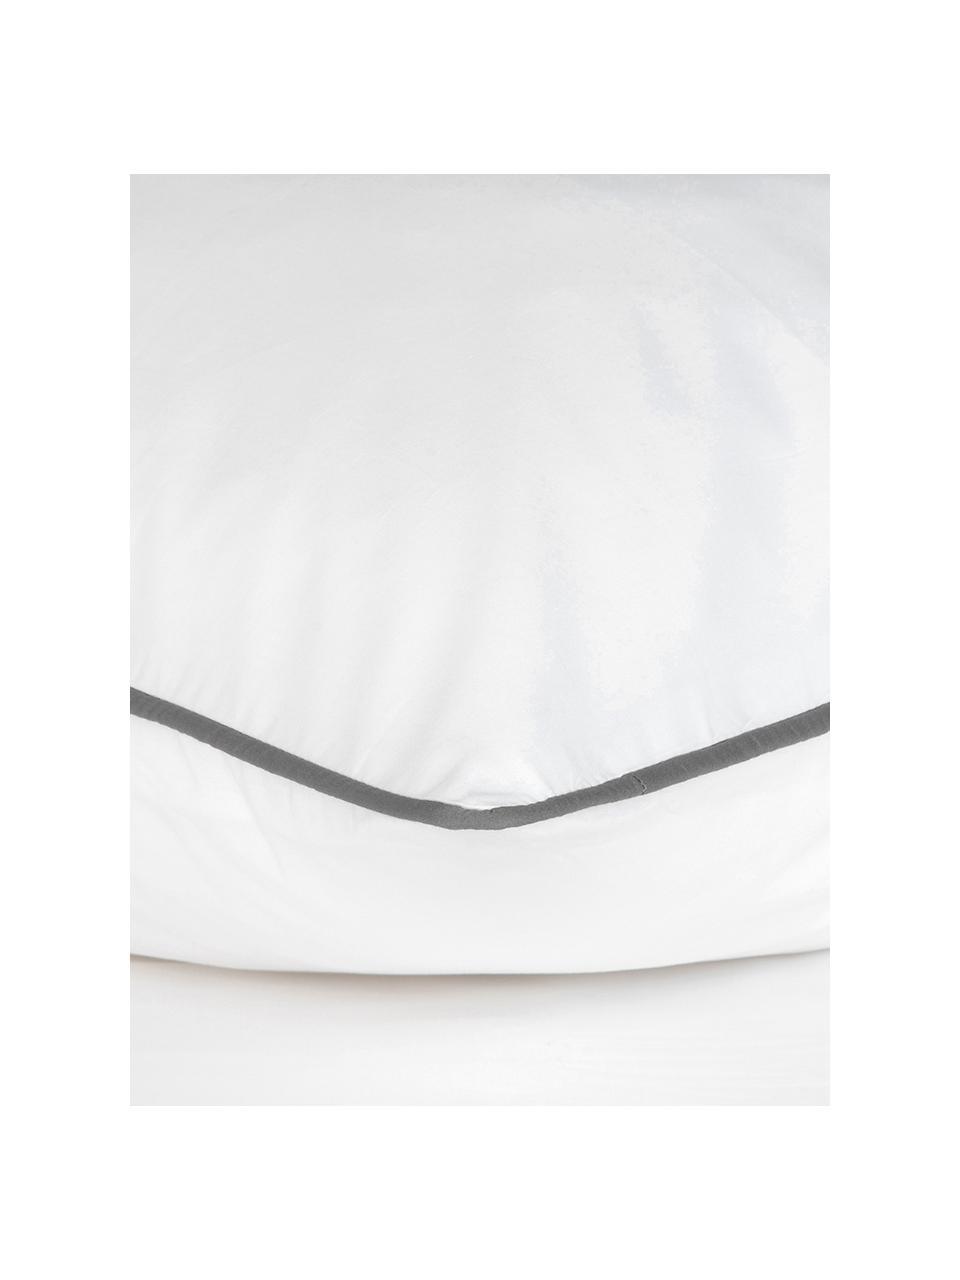 Baumwollperkal-Bettwäsche Daria in Weiß mit Keder, Webart: Perkal Fadendichte 200 TC, WeißKederumrandung: Dunkelgrau, 135 x 200 cm + 1 Kissen 80 x 80 cm